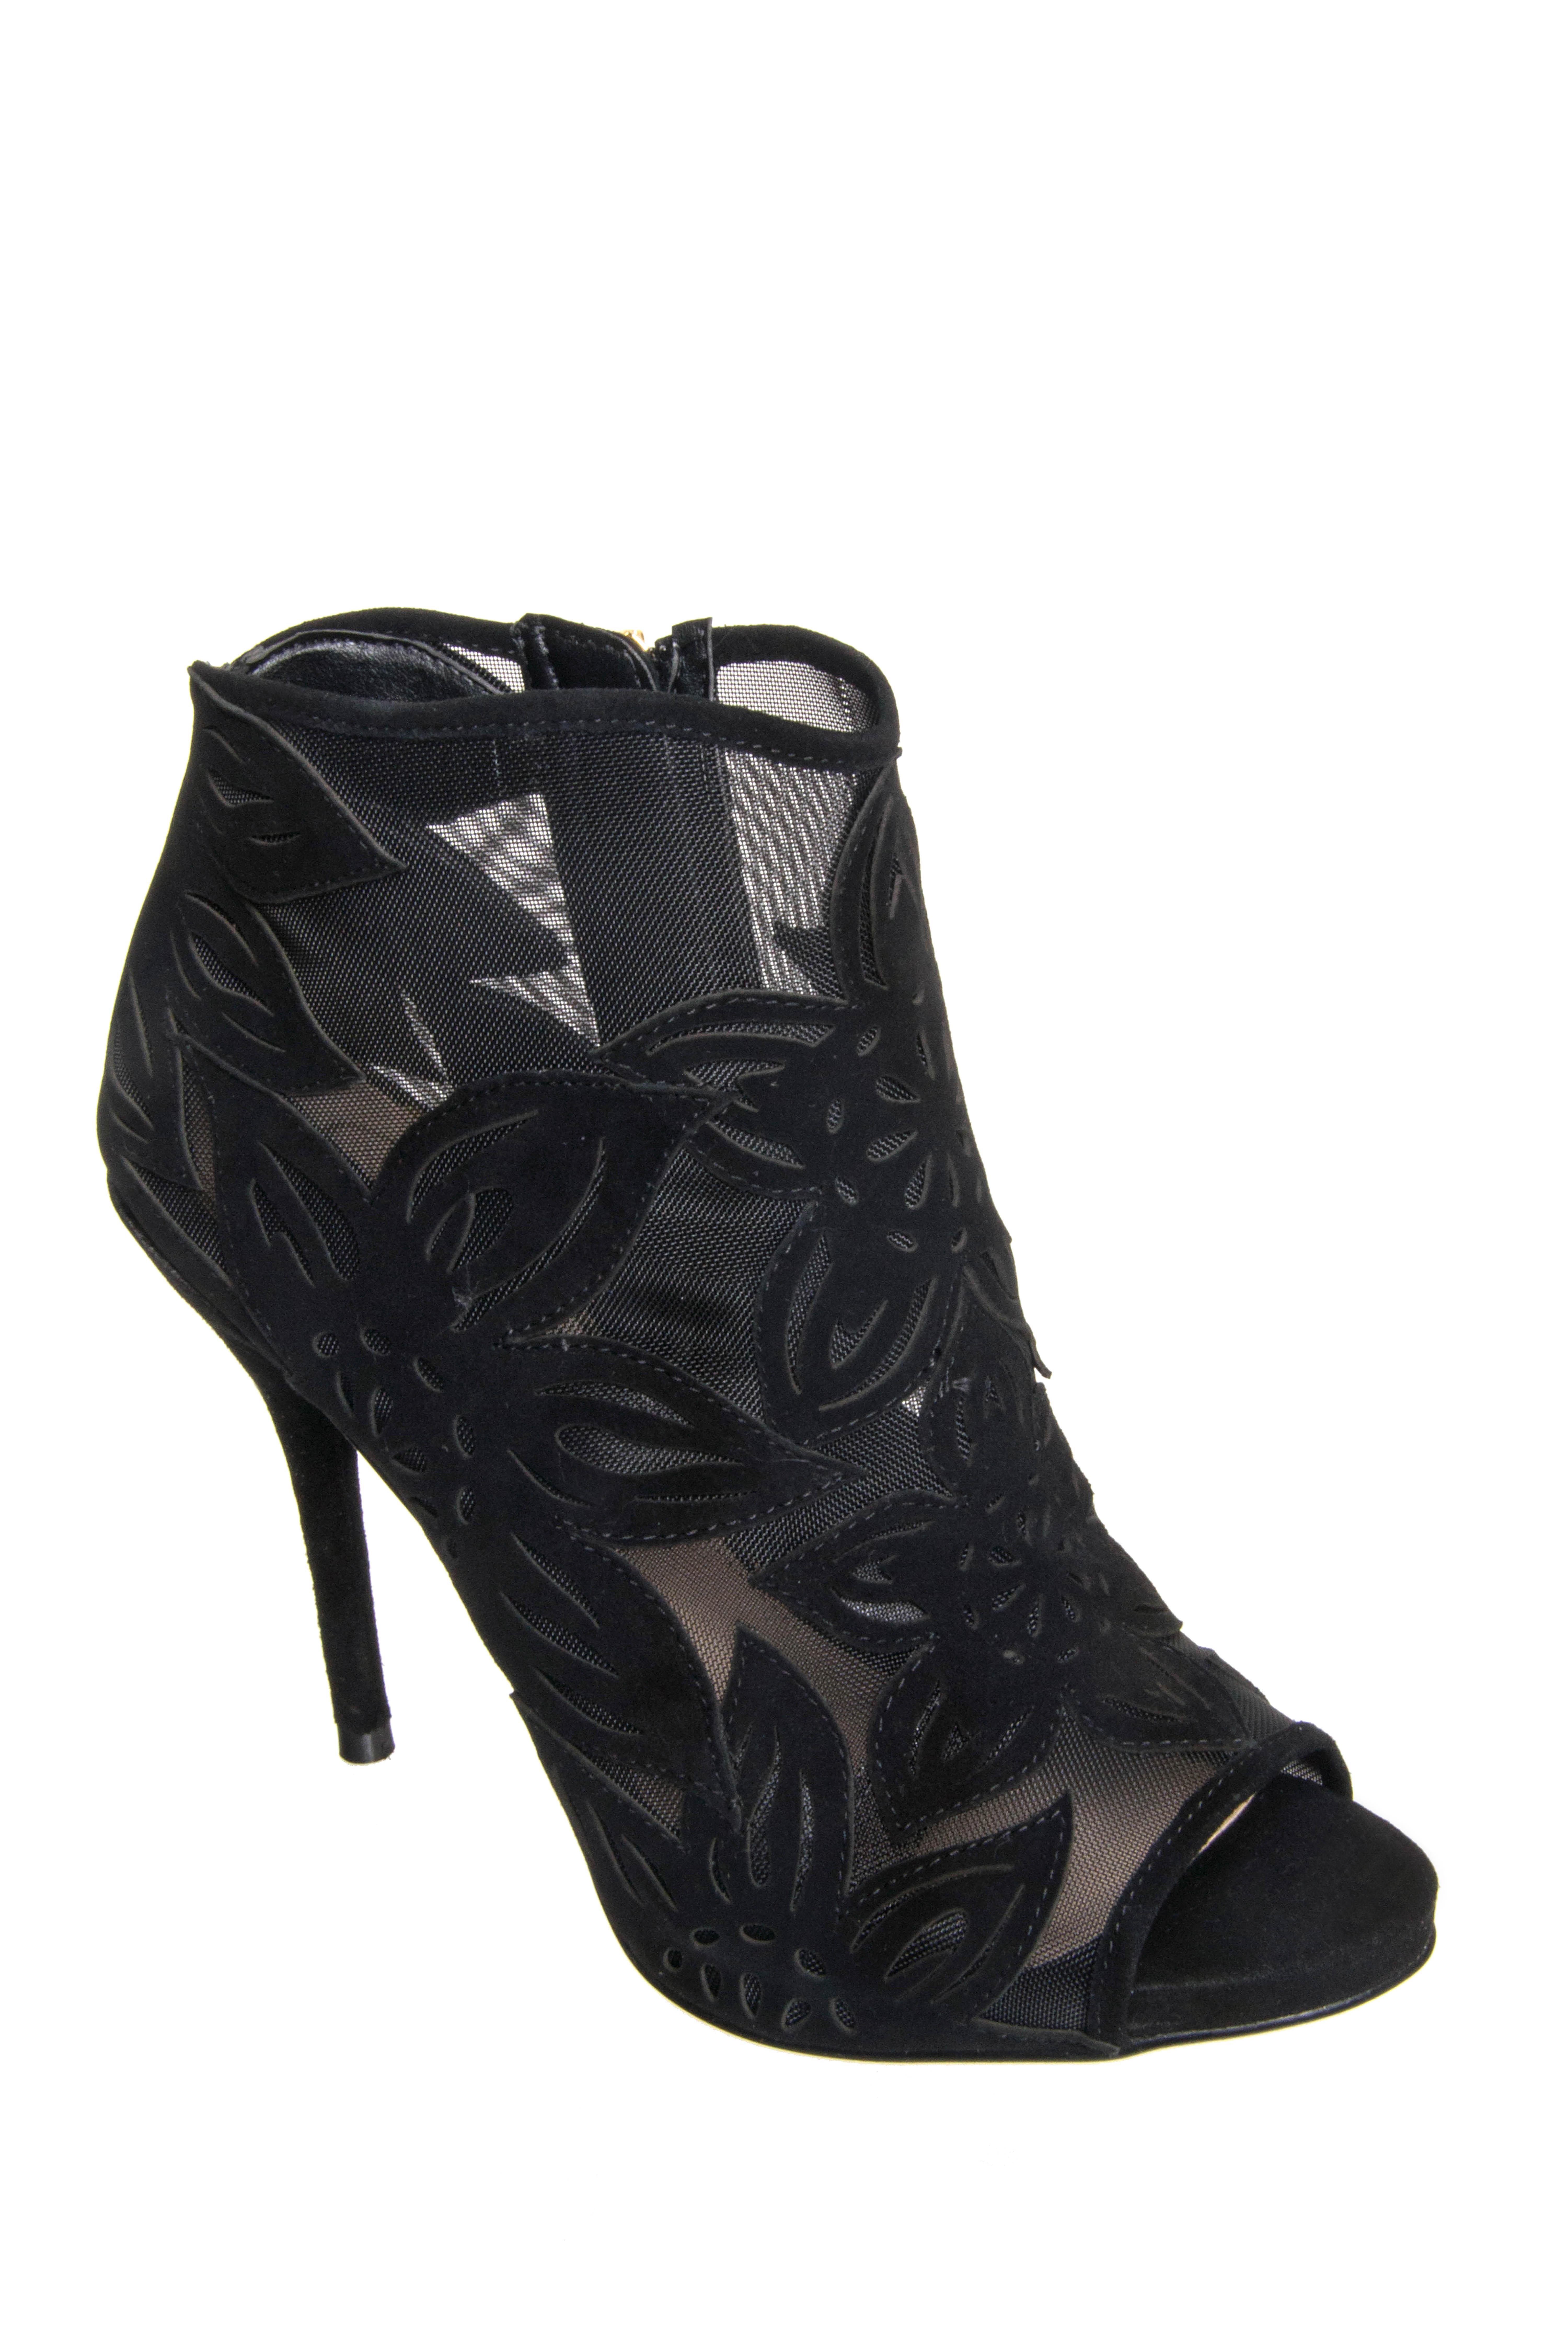 Jessica Simpson Bliths High Heel Booties - Black